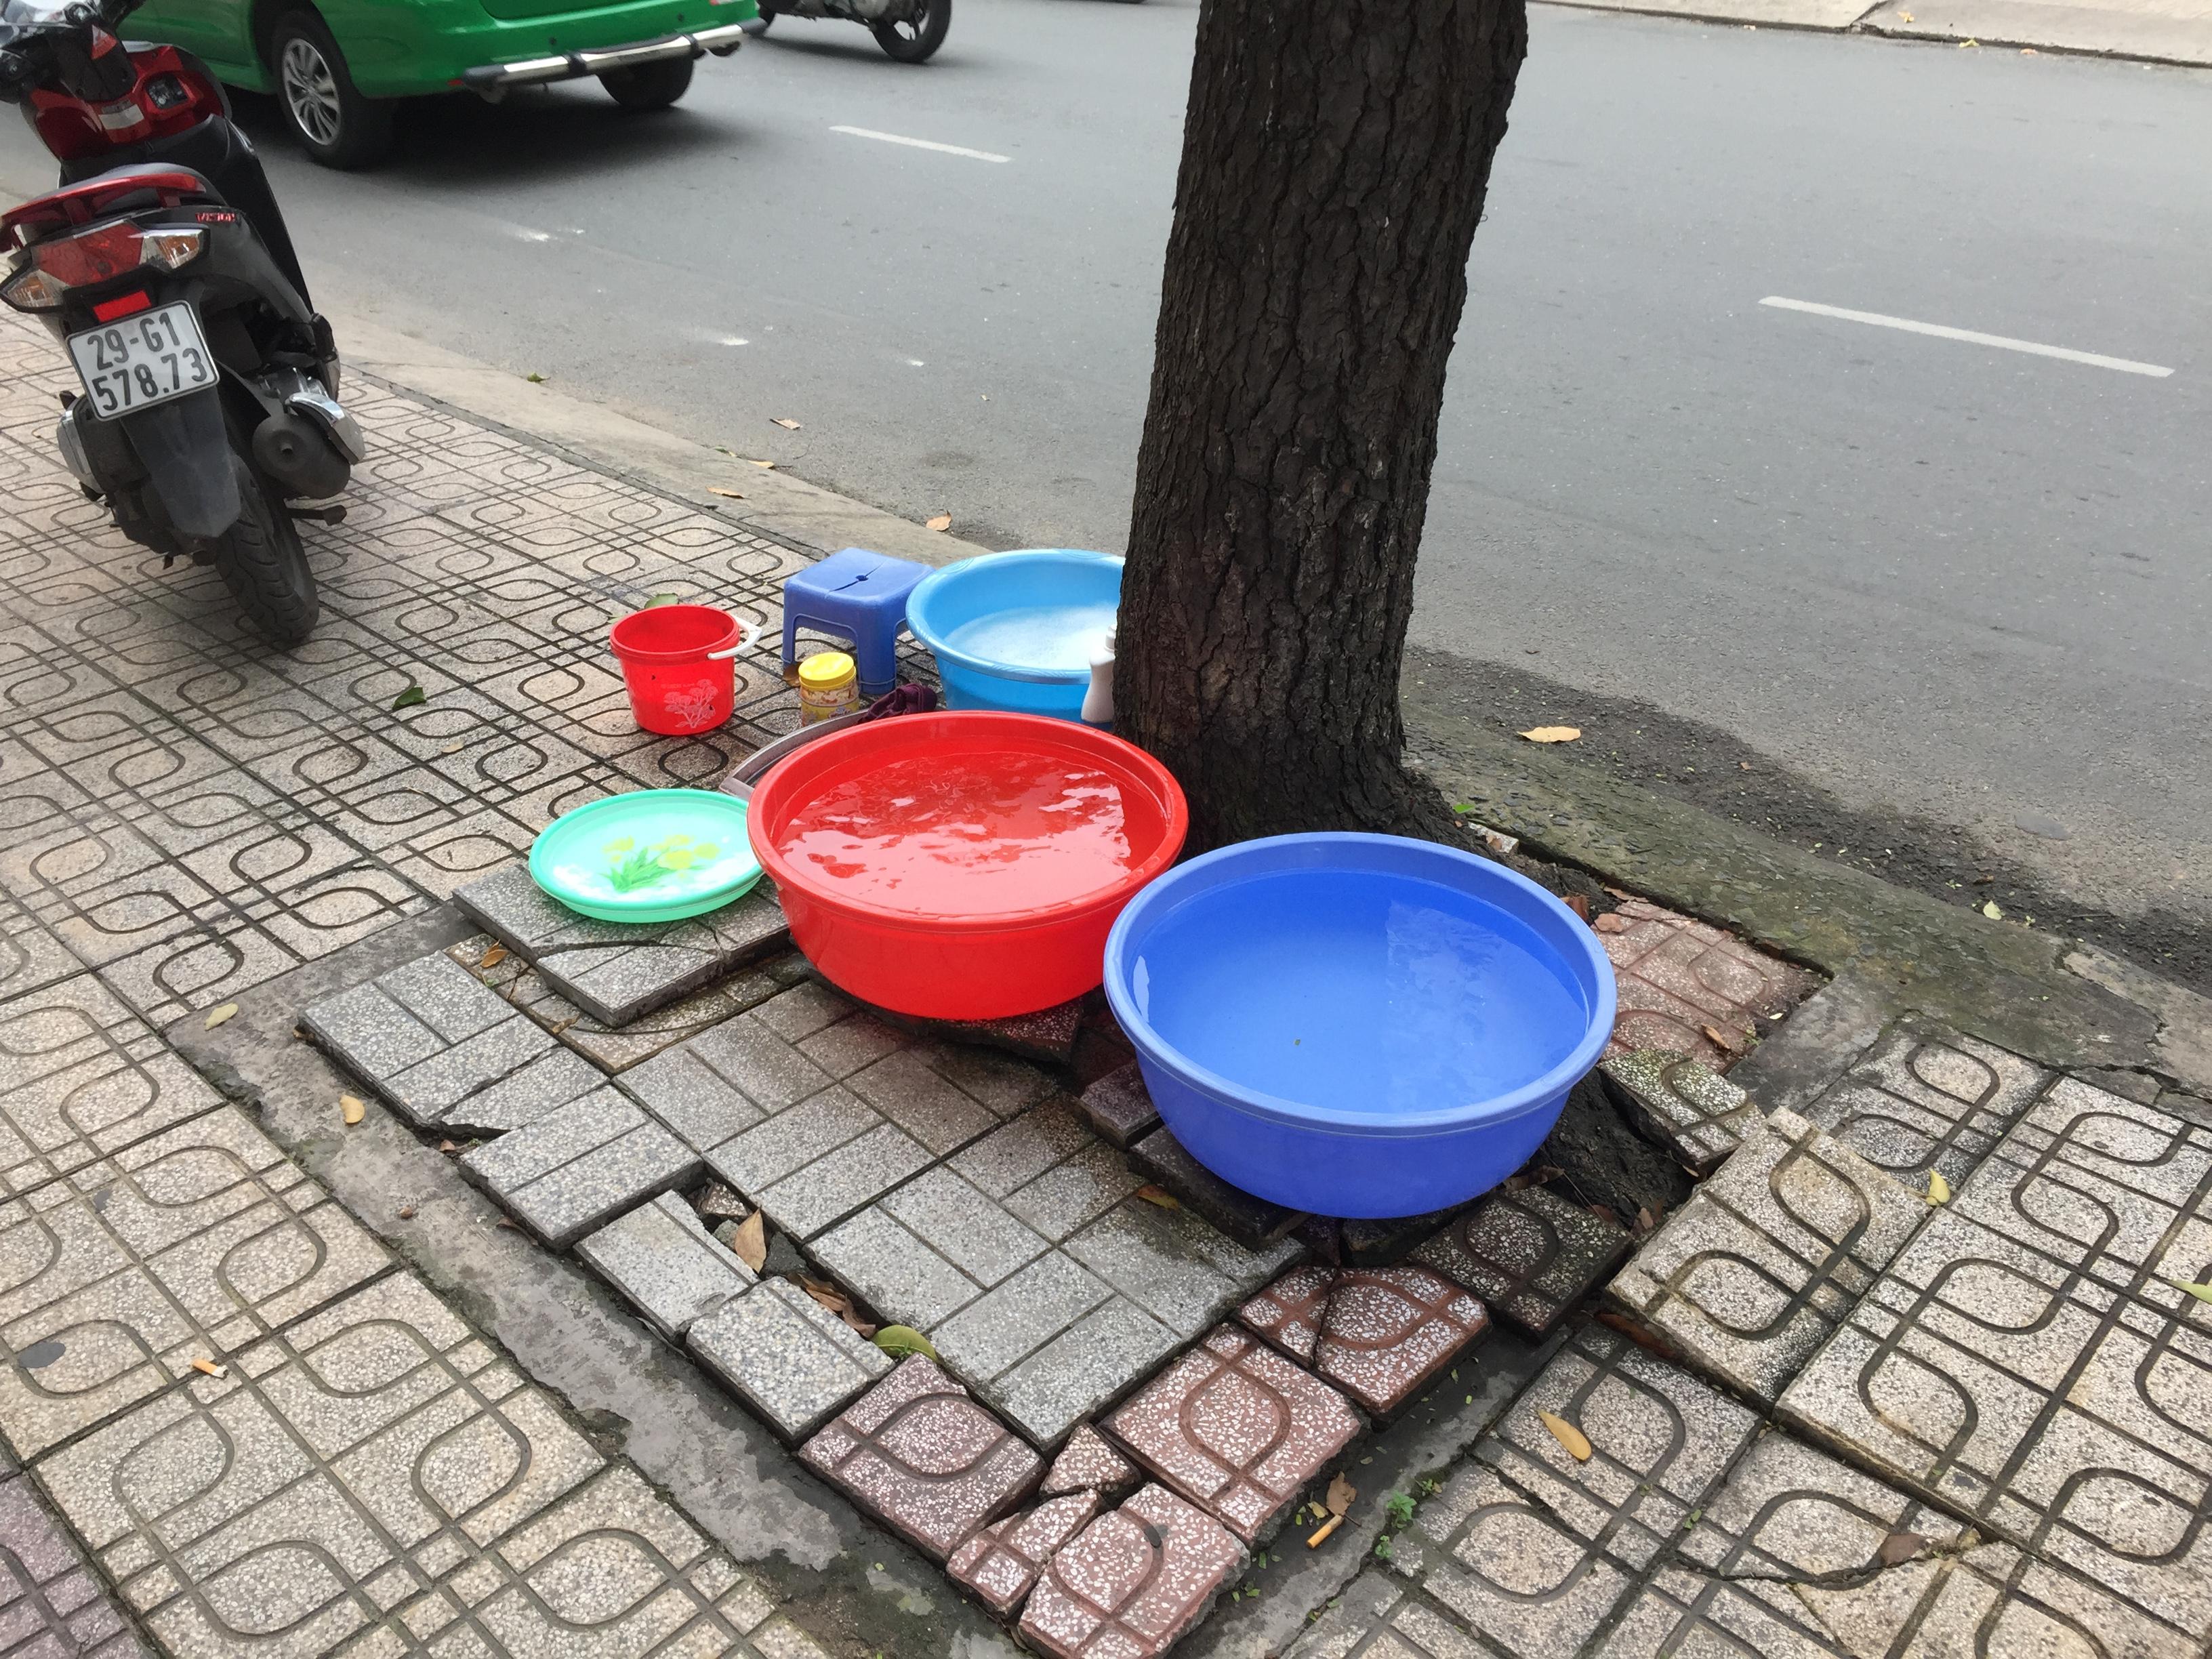 A street dishwashing station